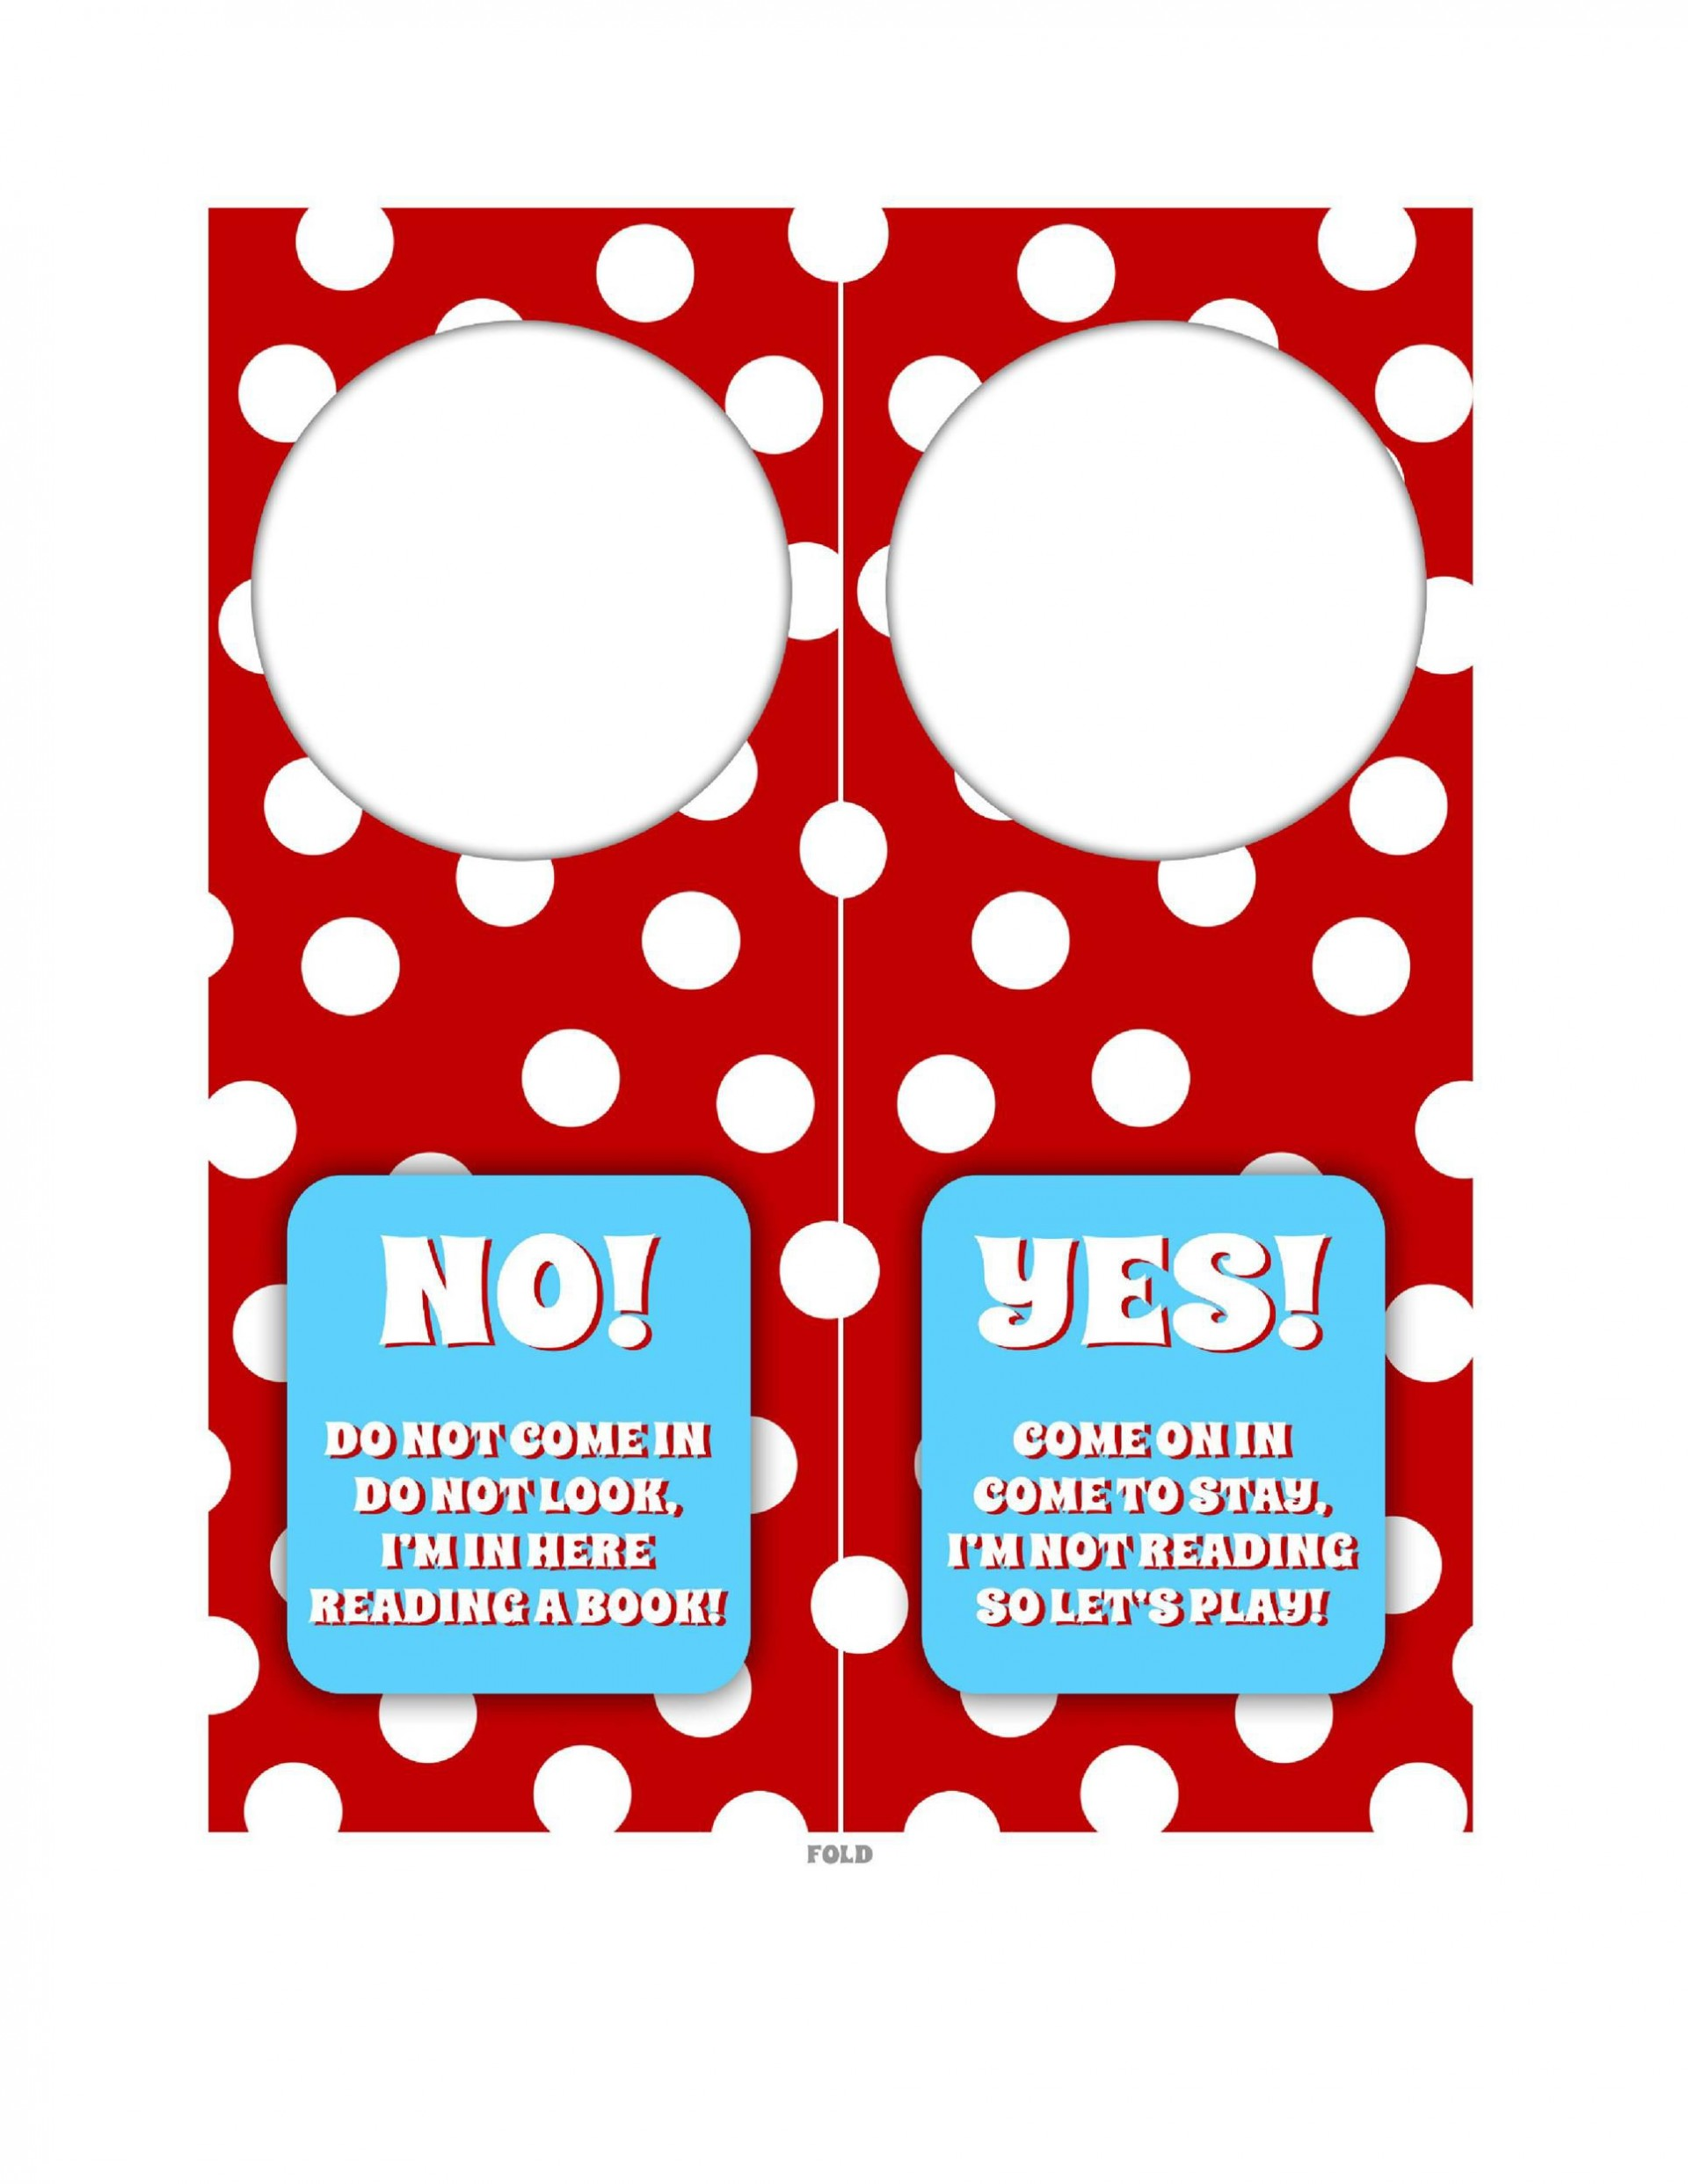 005 Dreaded Free Printable Door Hanger Template Design  Templates Wedding Editable1920